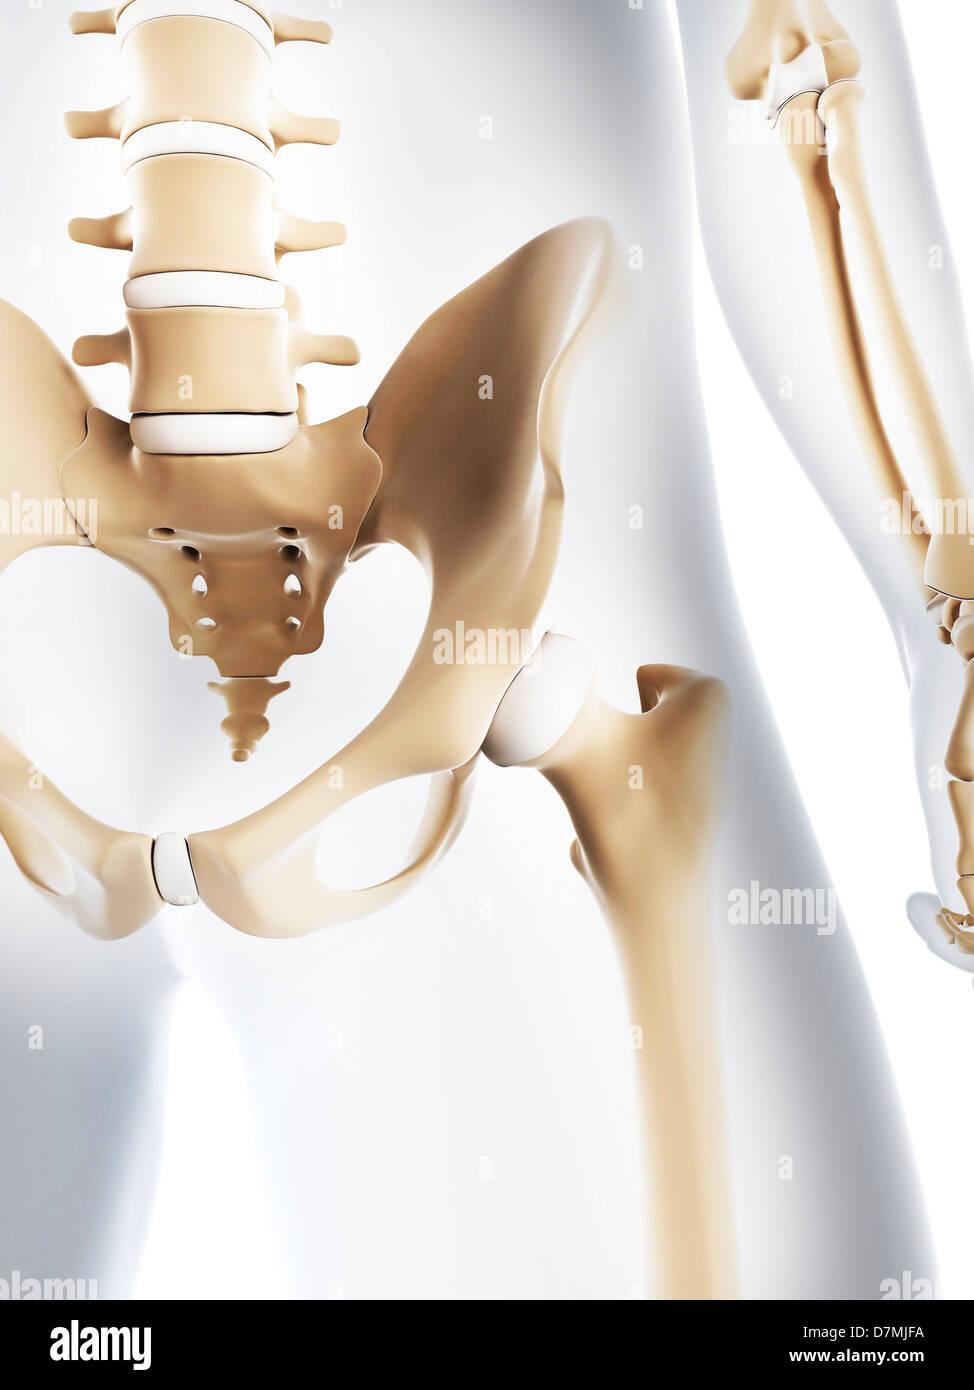 Male Pelvis Bones Artwork Stock Photo 56387278 Alamy